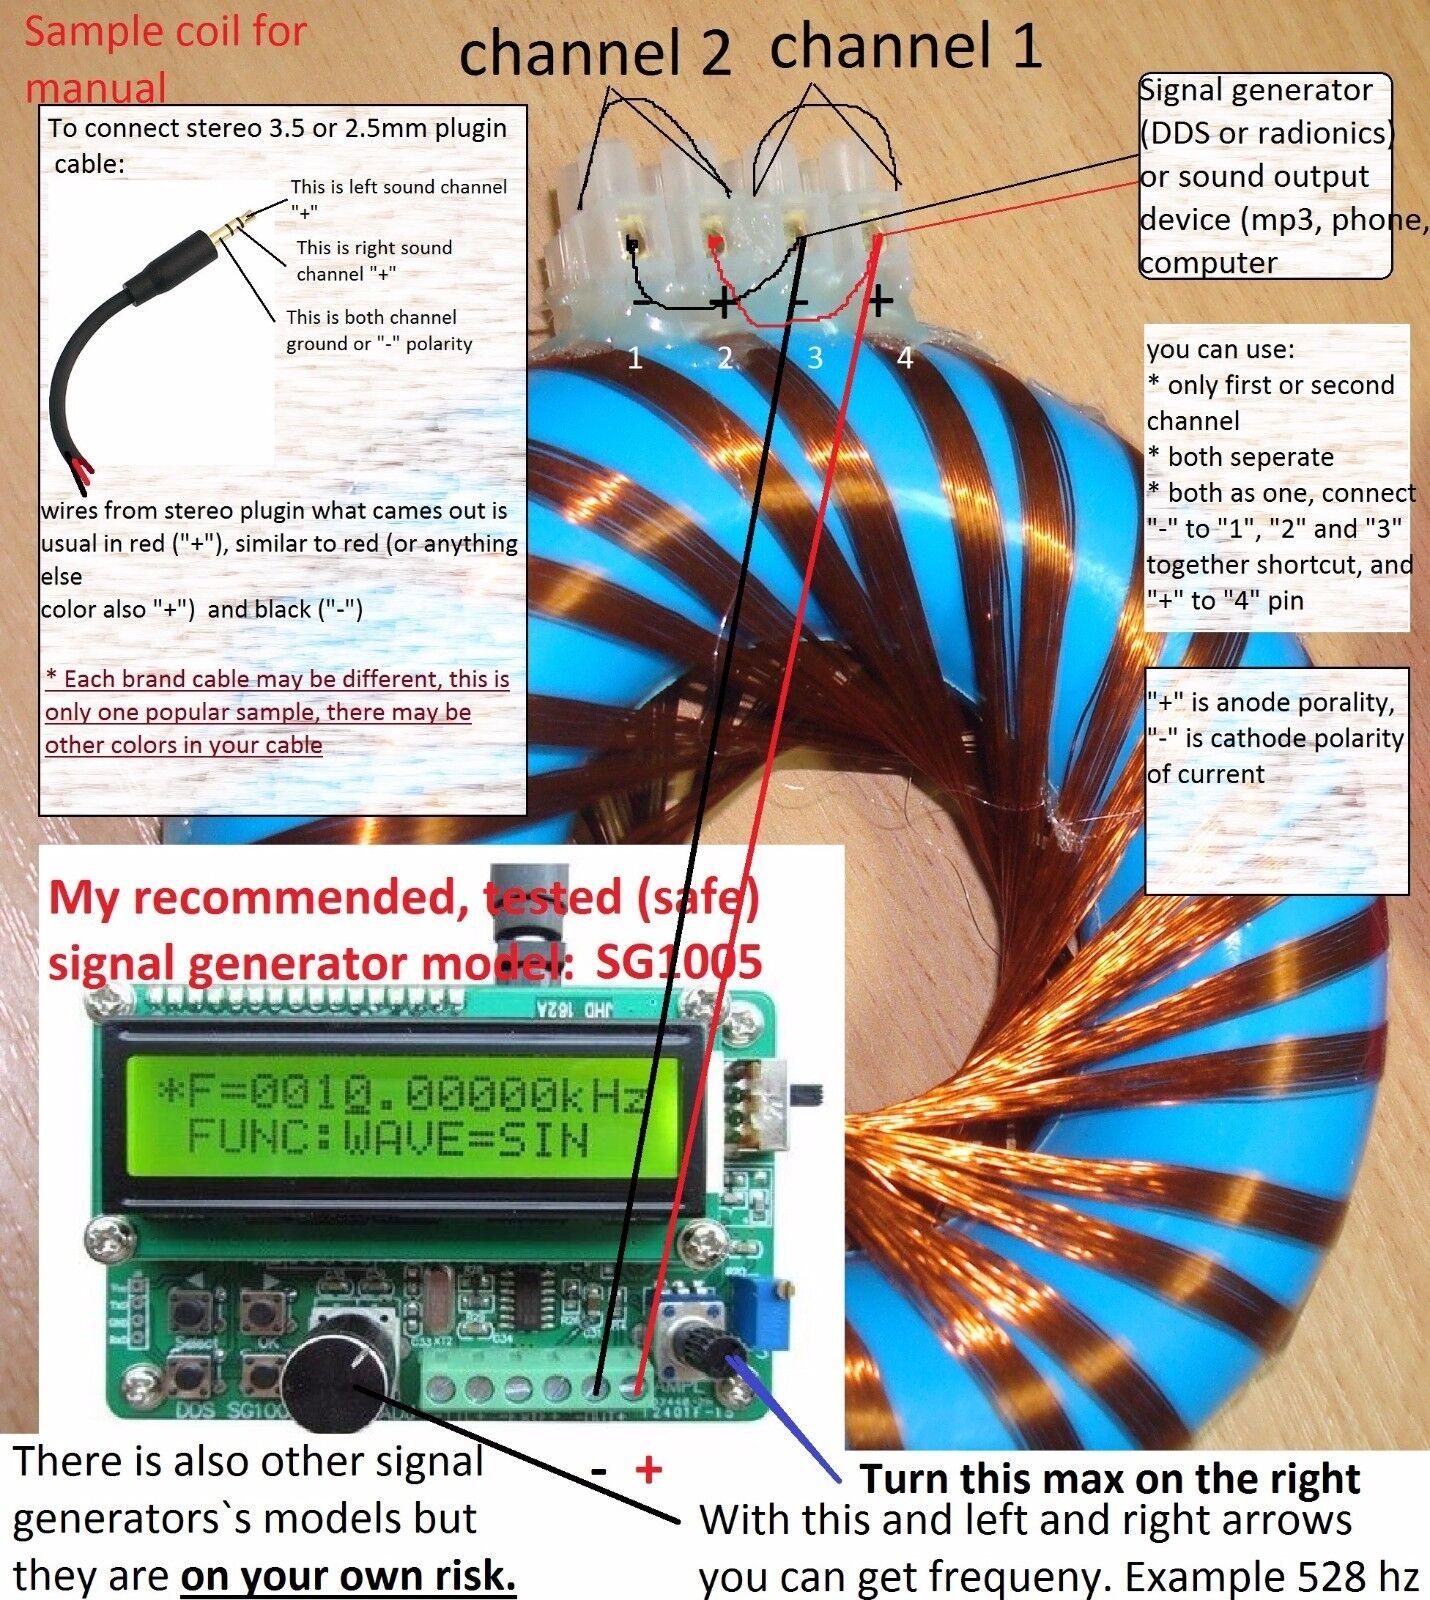 Rodin Coil Antenna Diagram Marko Frequency Generator Orgone Tesla Radionics 1430x1600